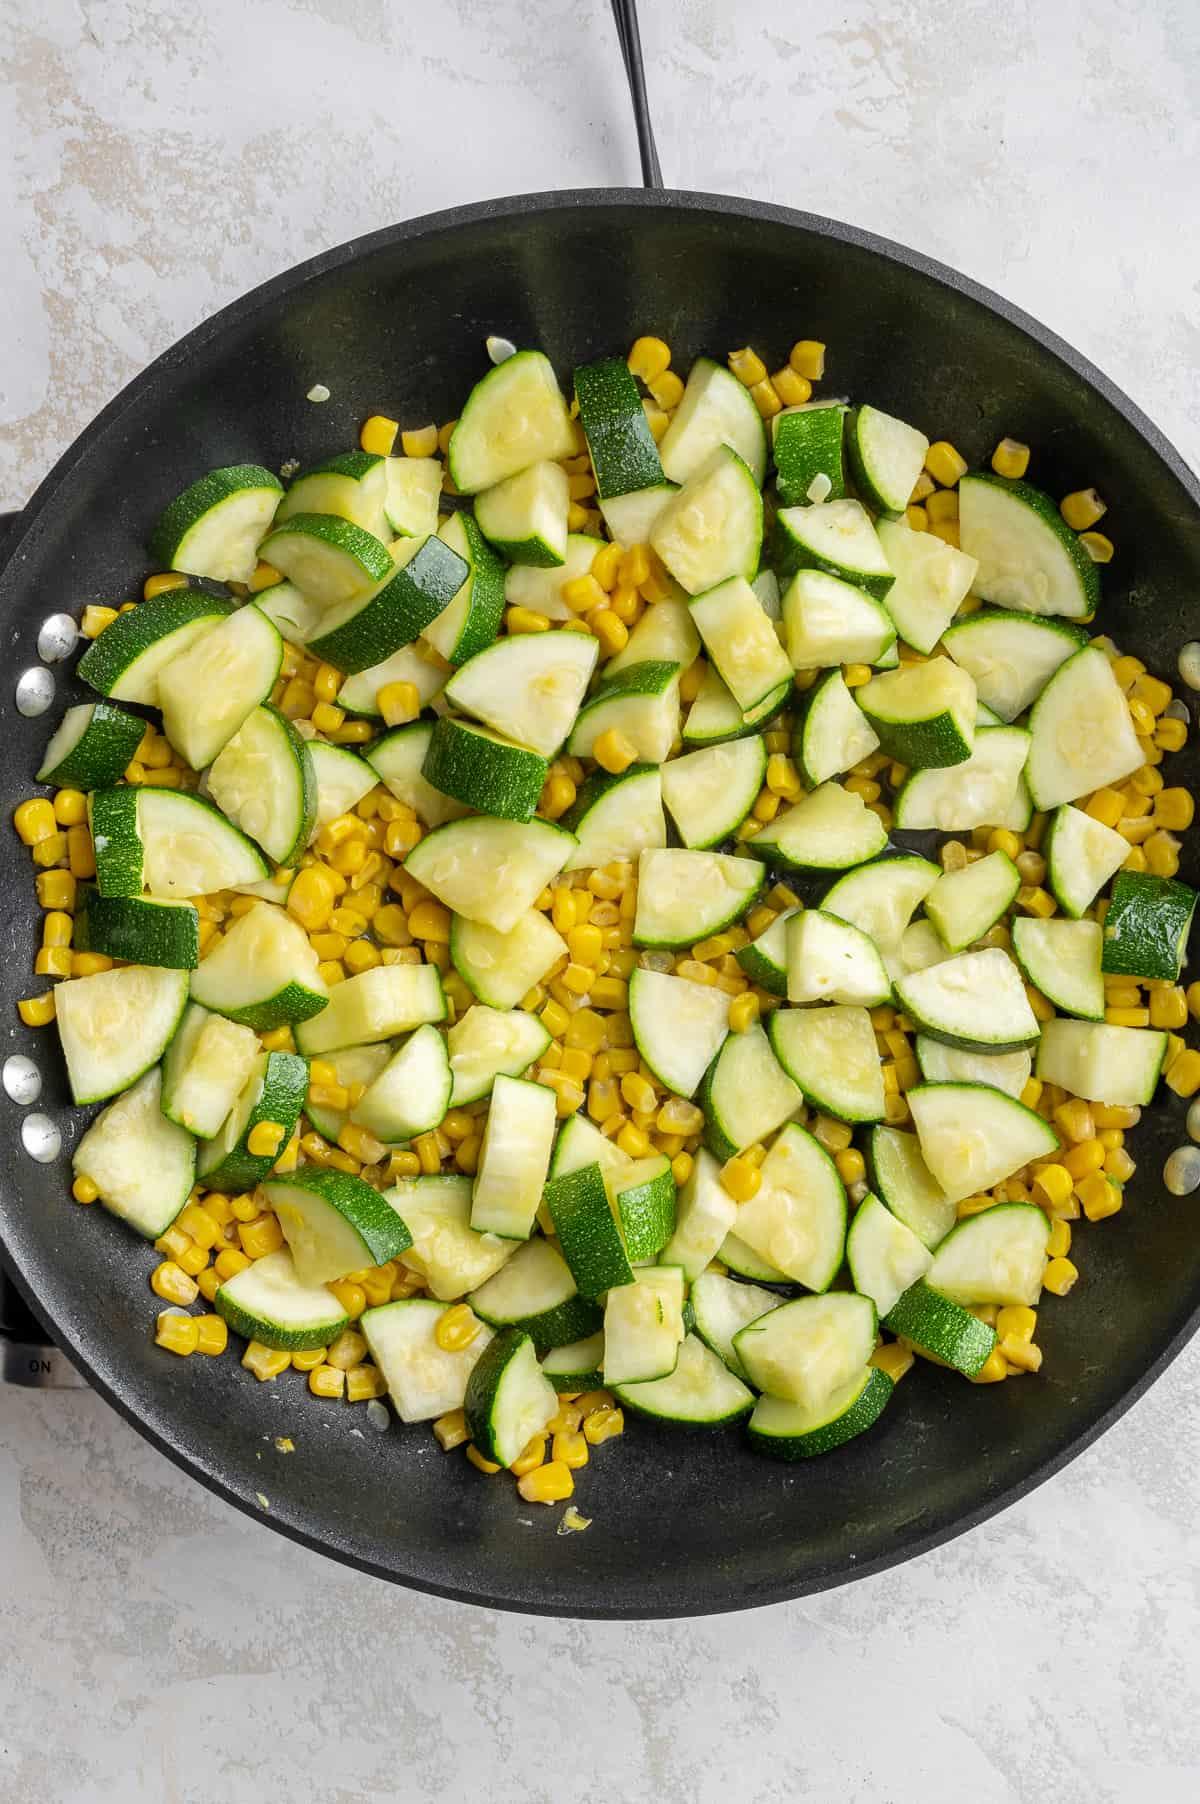 corn and zucchini sautéed in a pan